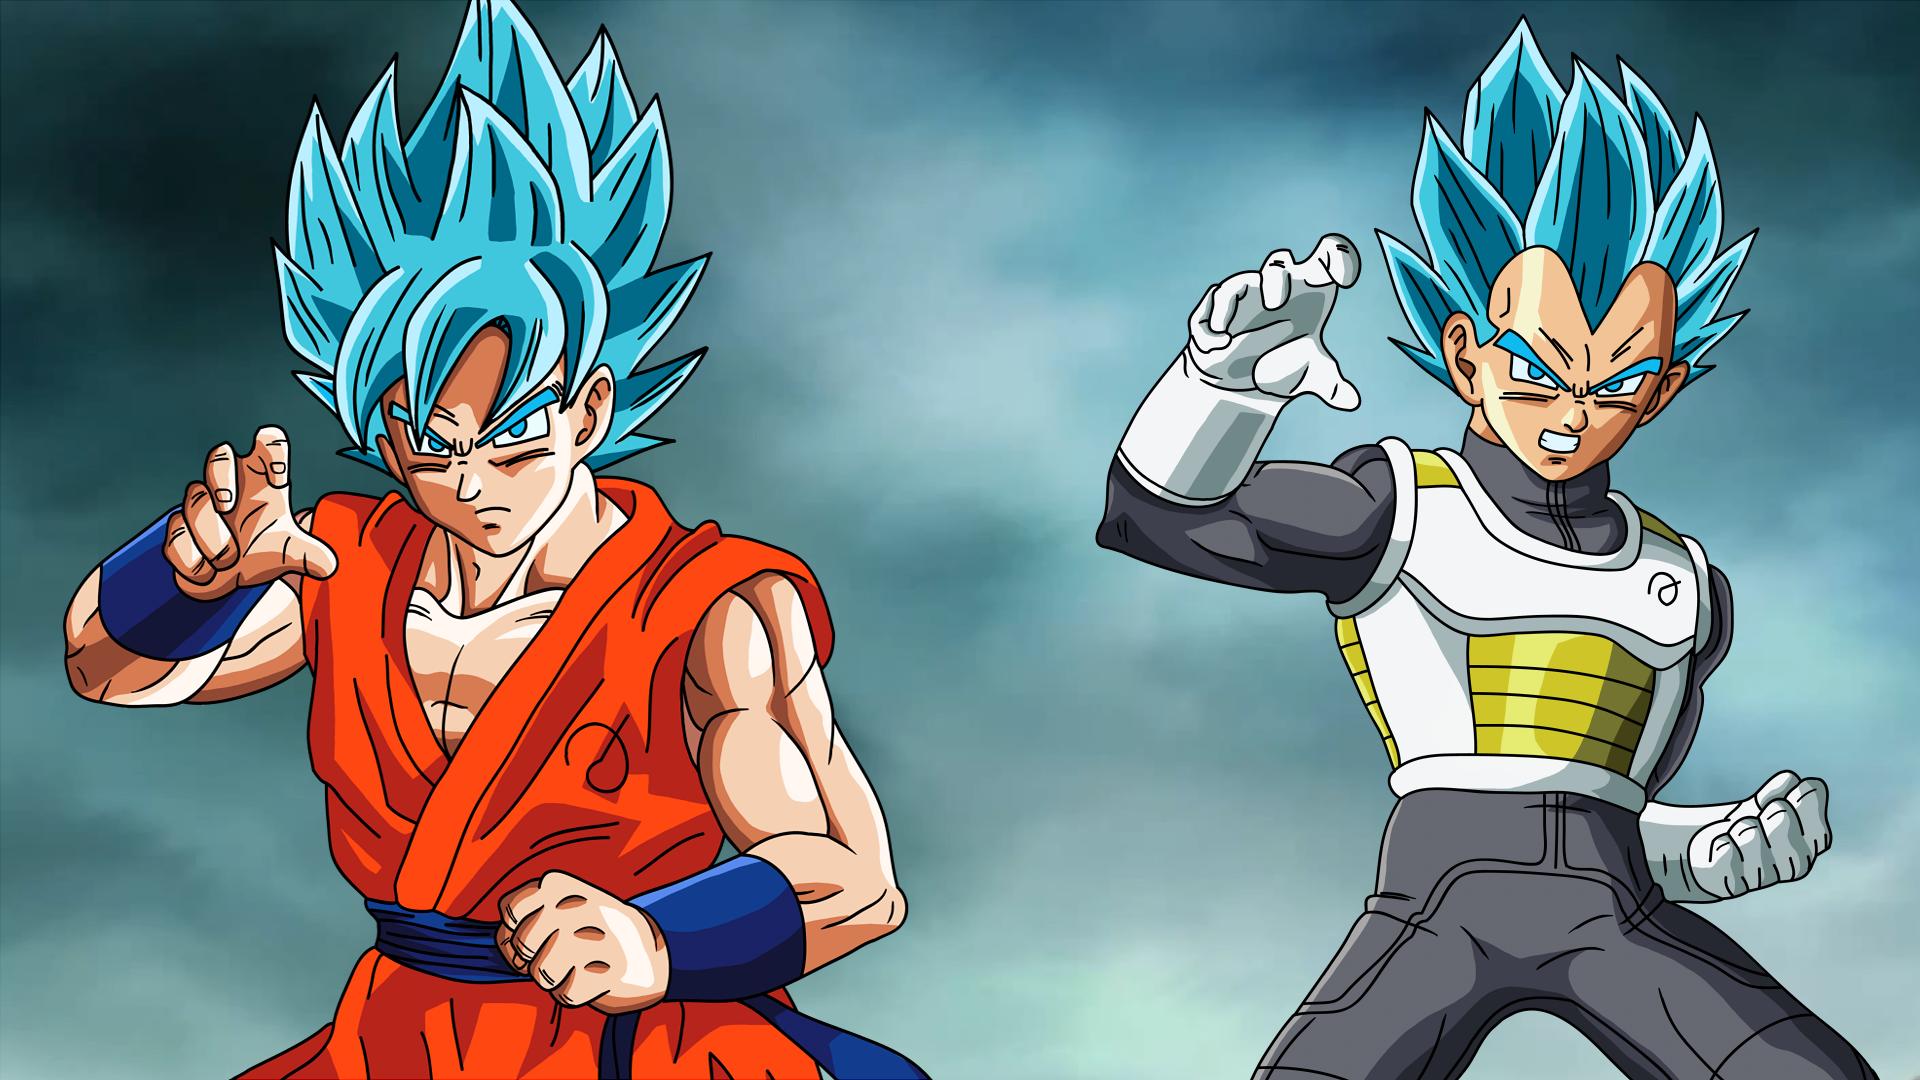 Free Download Goku And Vegeta Fukkatsu No F Ssjgod Ss Wallpaper By